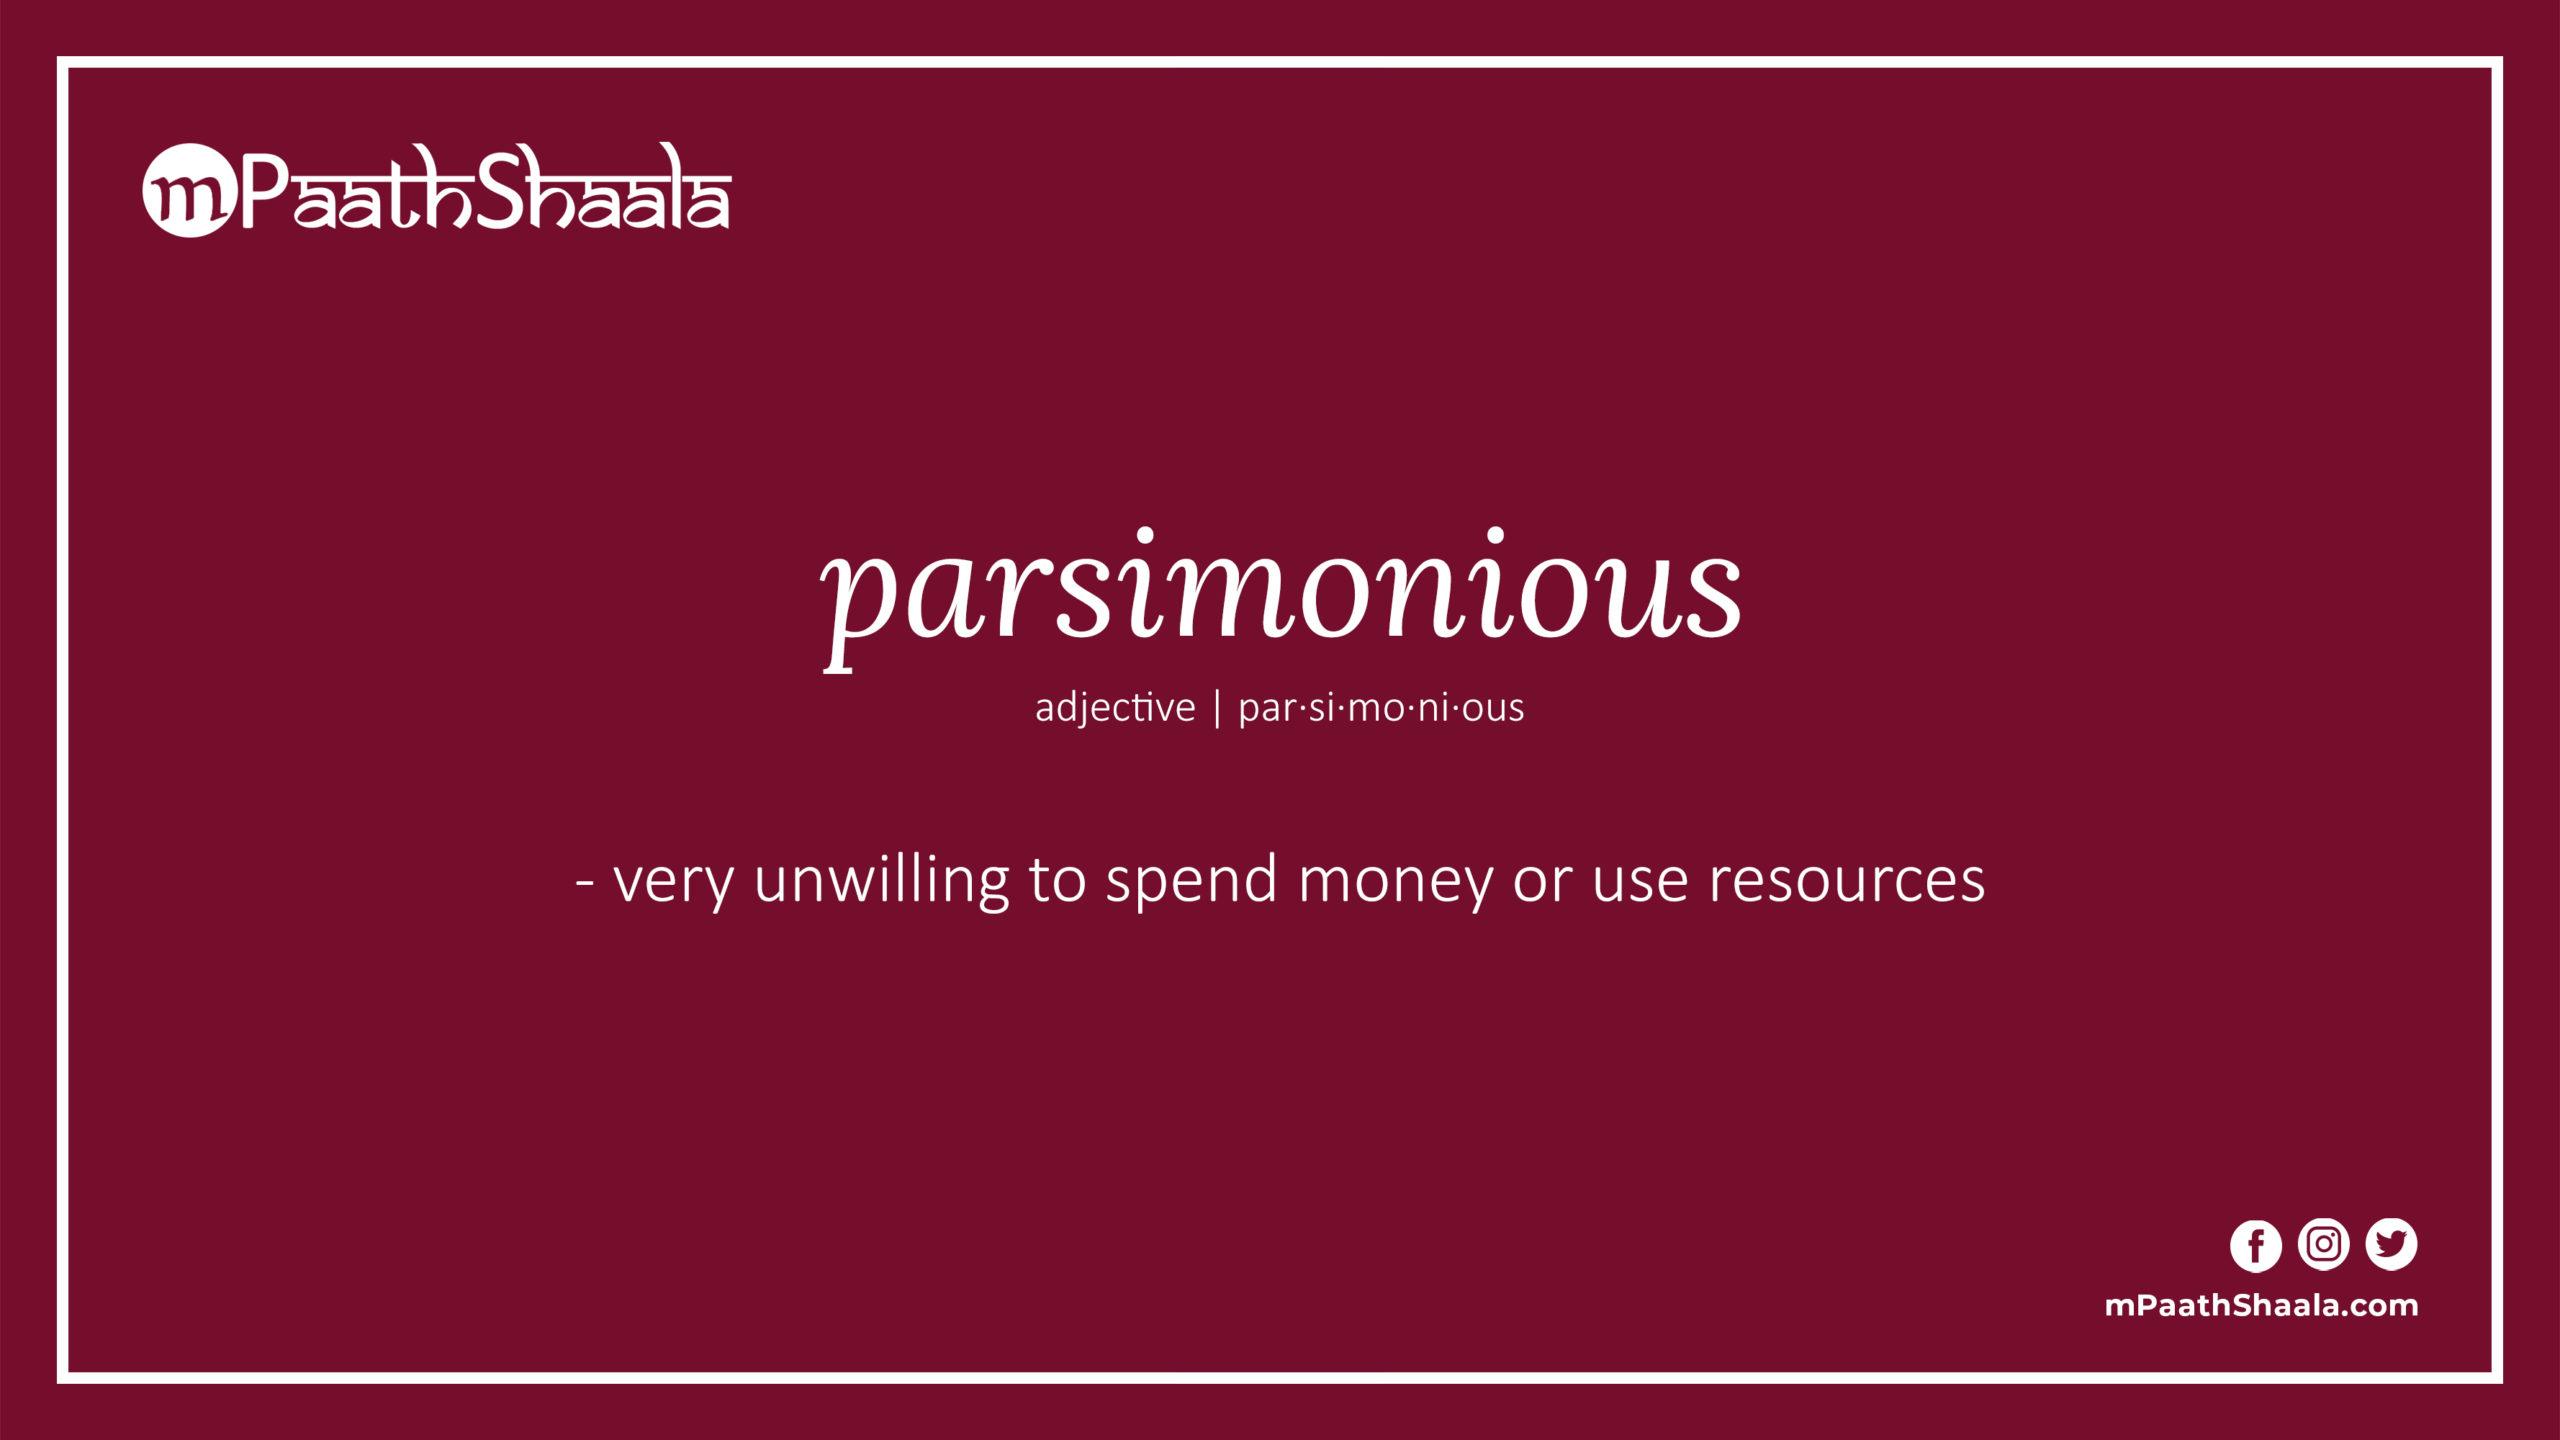 parsimonious | Definition of parsimonious - mPaathShaala